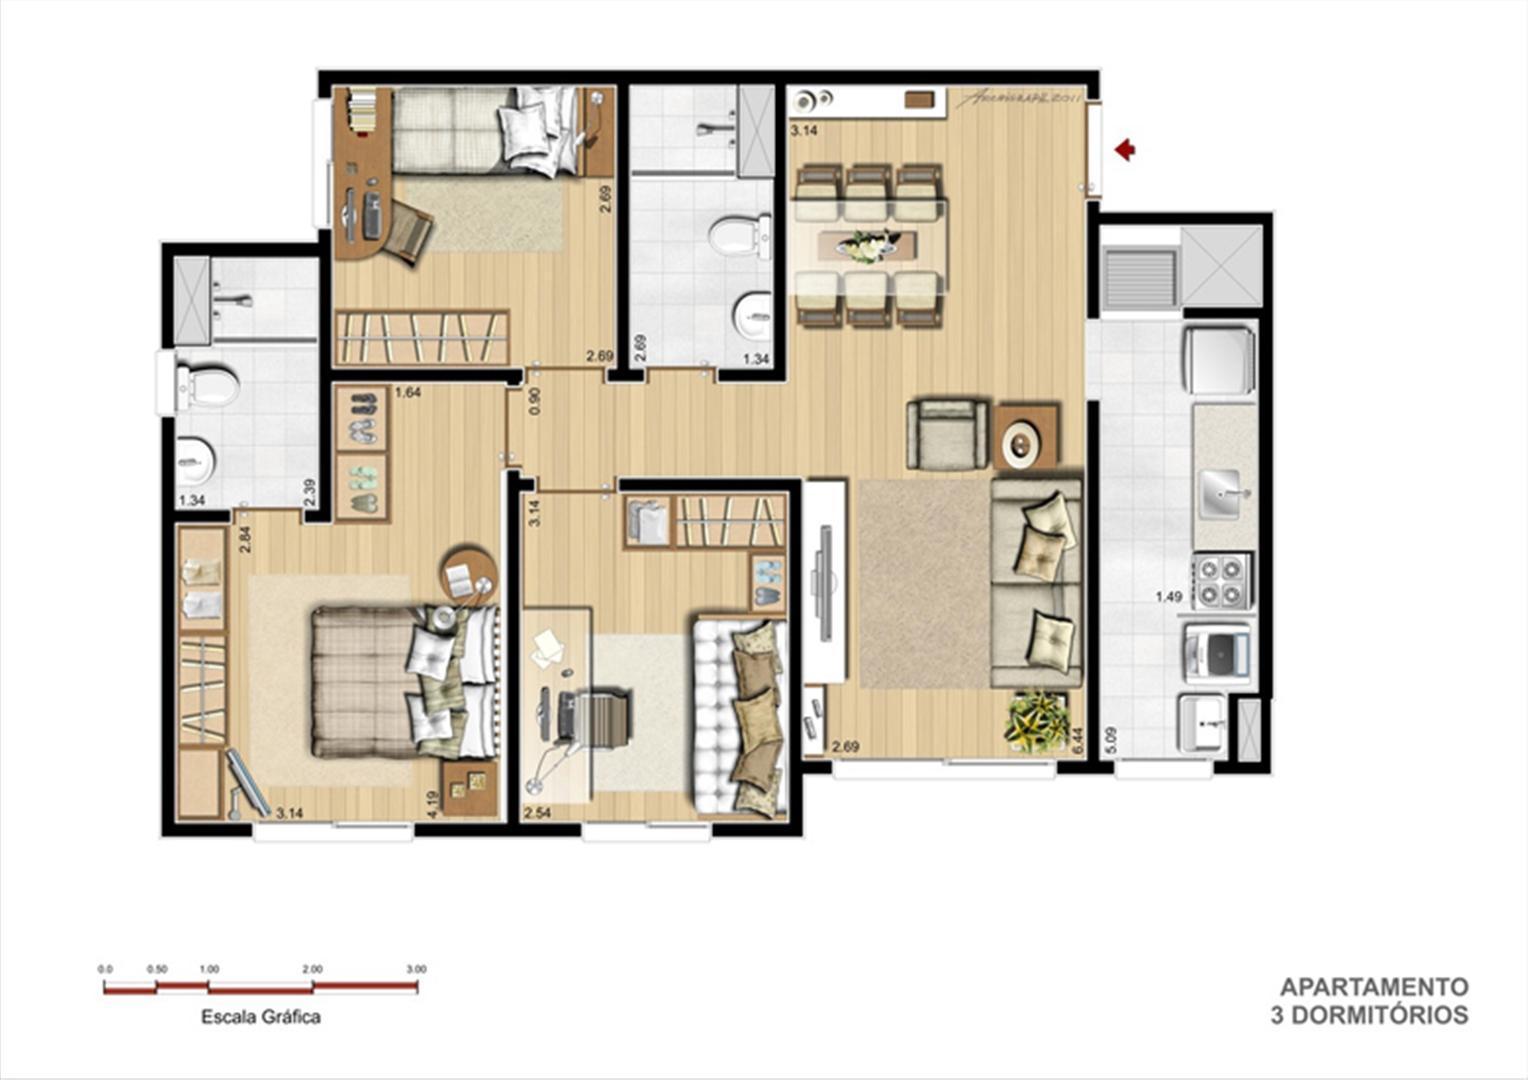 Torre A - Tipo 3 dormitórios | Supera Condomínio Clube – Apartamento  próximo ao Zaffari Zona Sul - Porto Alegre - Rio Grande do Sul